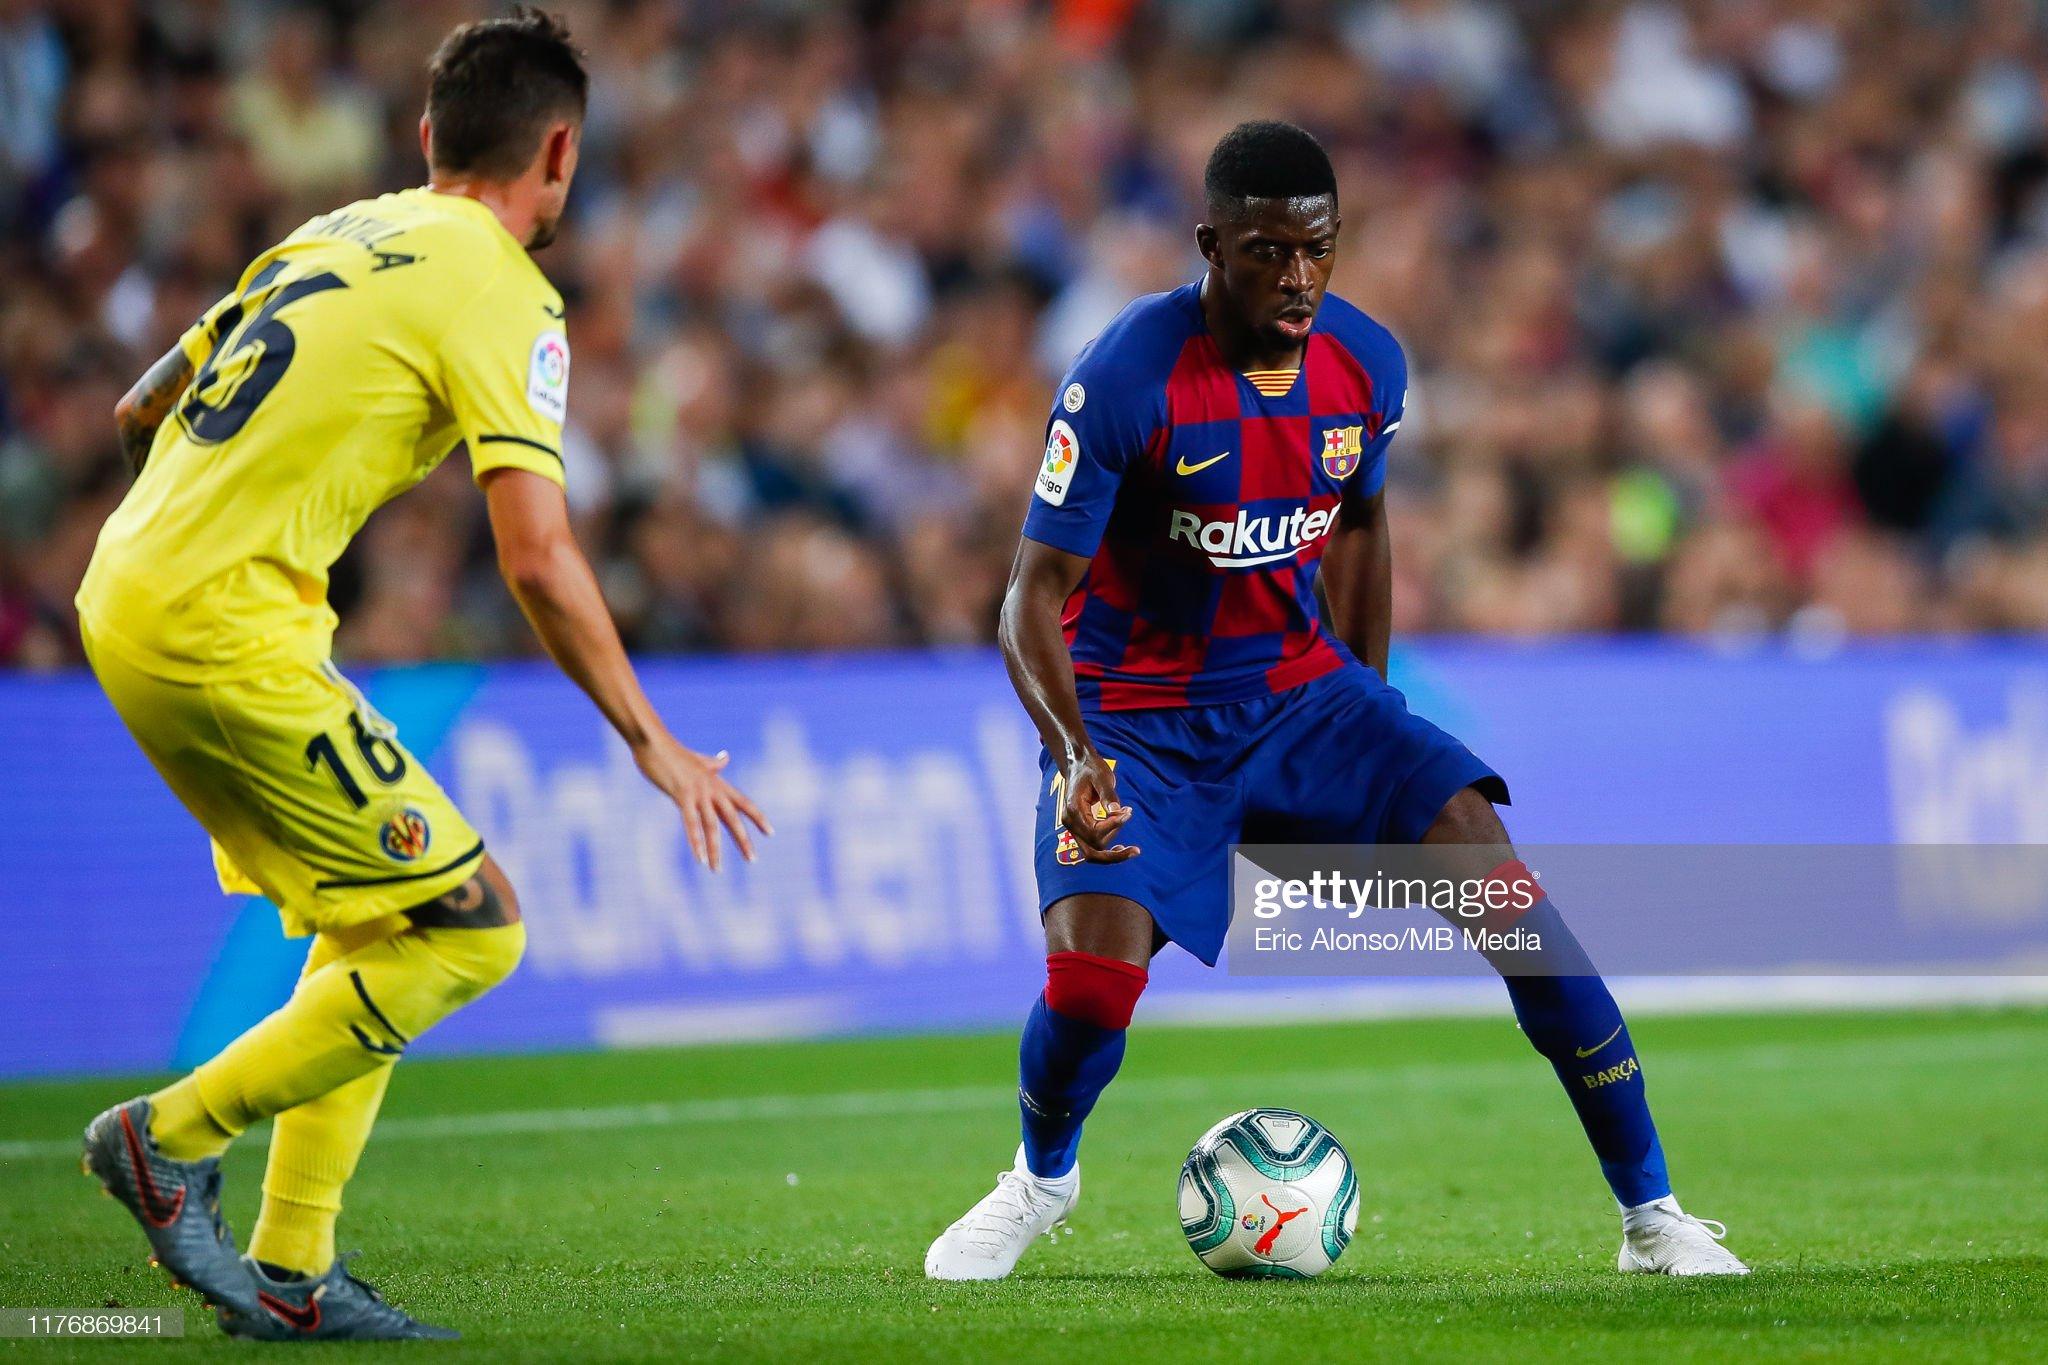 صور مباراة : برشلونة - فياريال 2-1 ( 24-09-2019 )  Ousmane-demebele-of-fc-barcelona-challenge-for-the-ball-against-of-picture-id1176869841?s=2048x2048